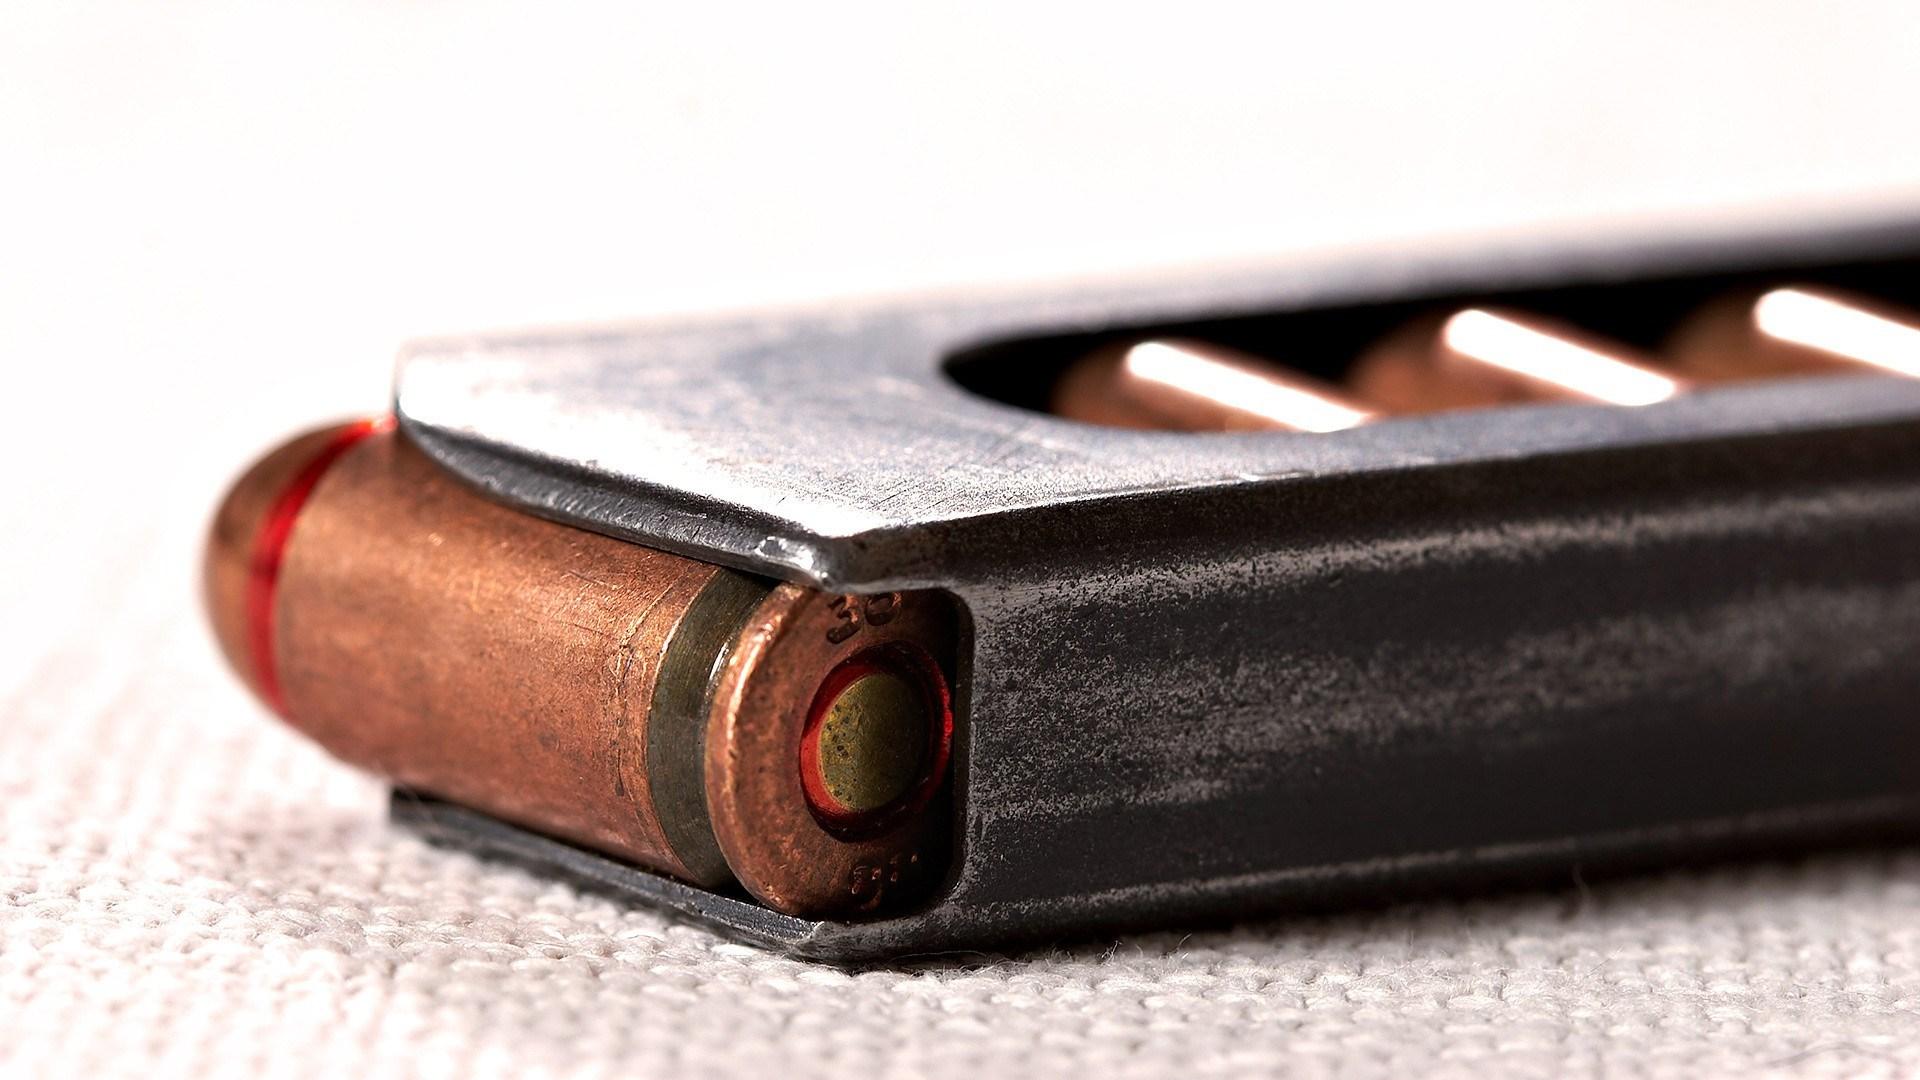 1920x1080-hd-bullet-wallpaper-wpc900804